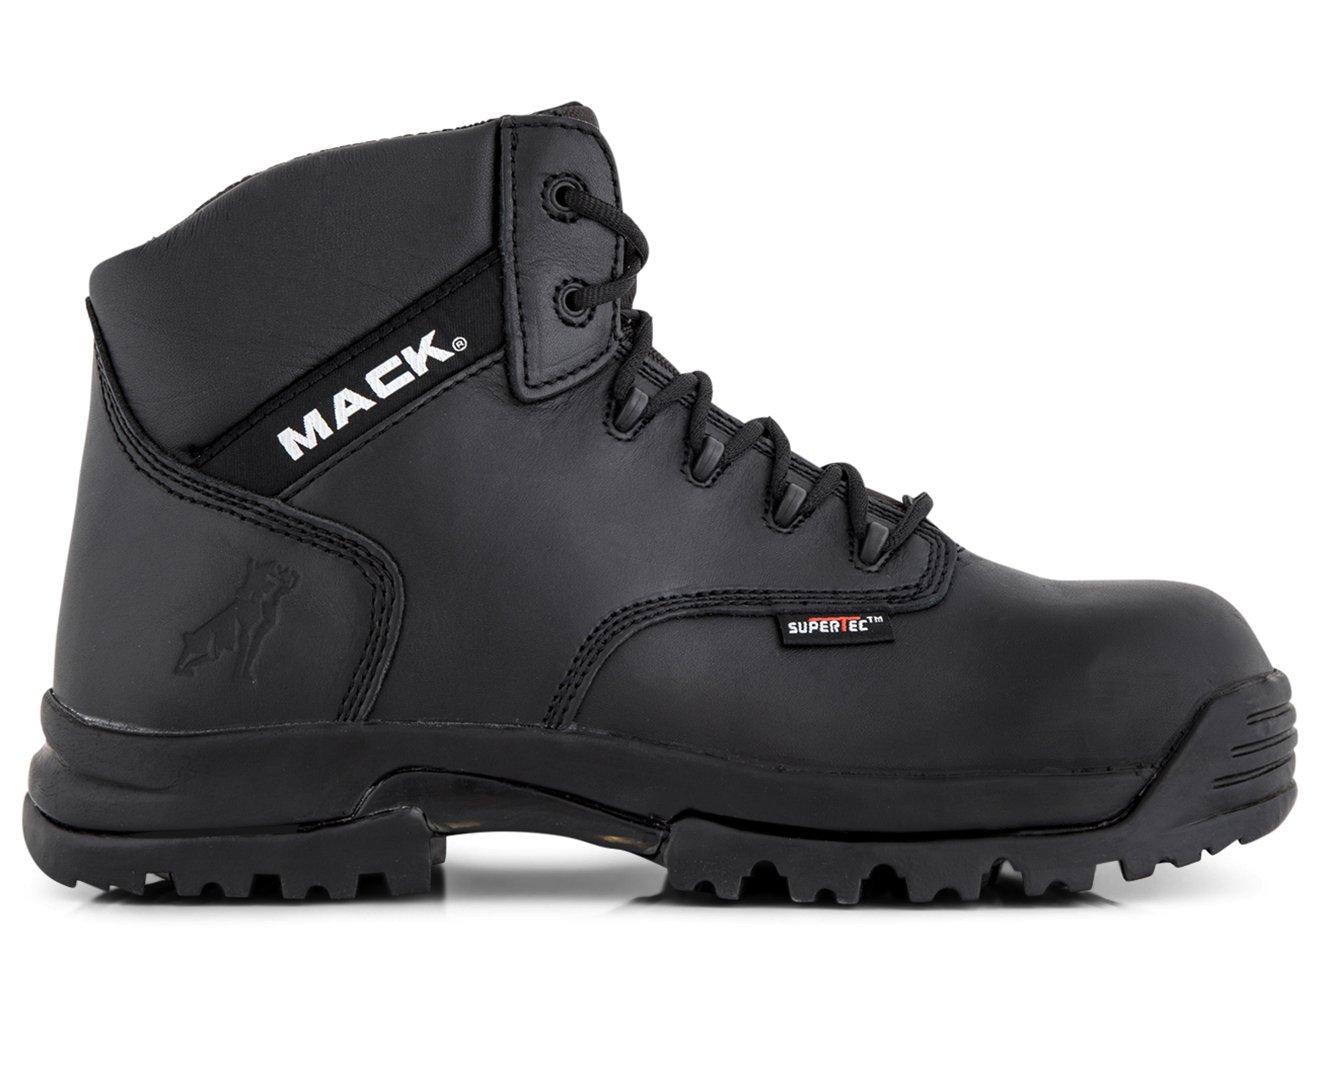 9c20e3eabb6 Mack Men's Titan Composite Safety Boot Black: Amazon.com.au: Fashion